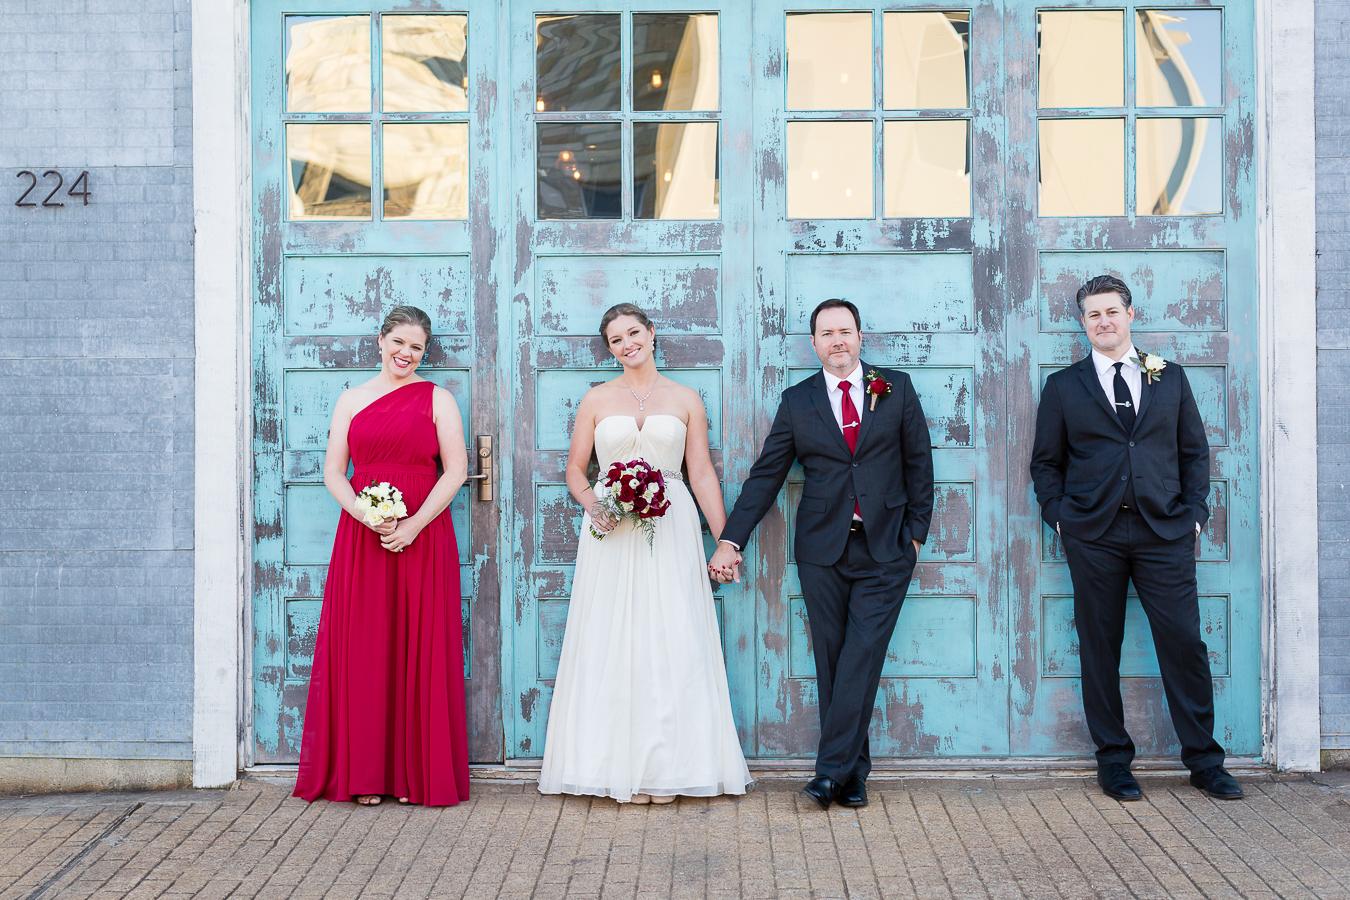 union-on-eighth-wedding-photographs-010.jpg